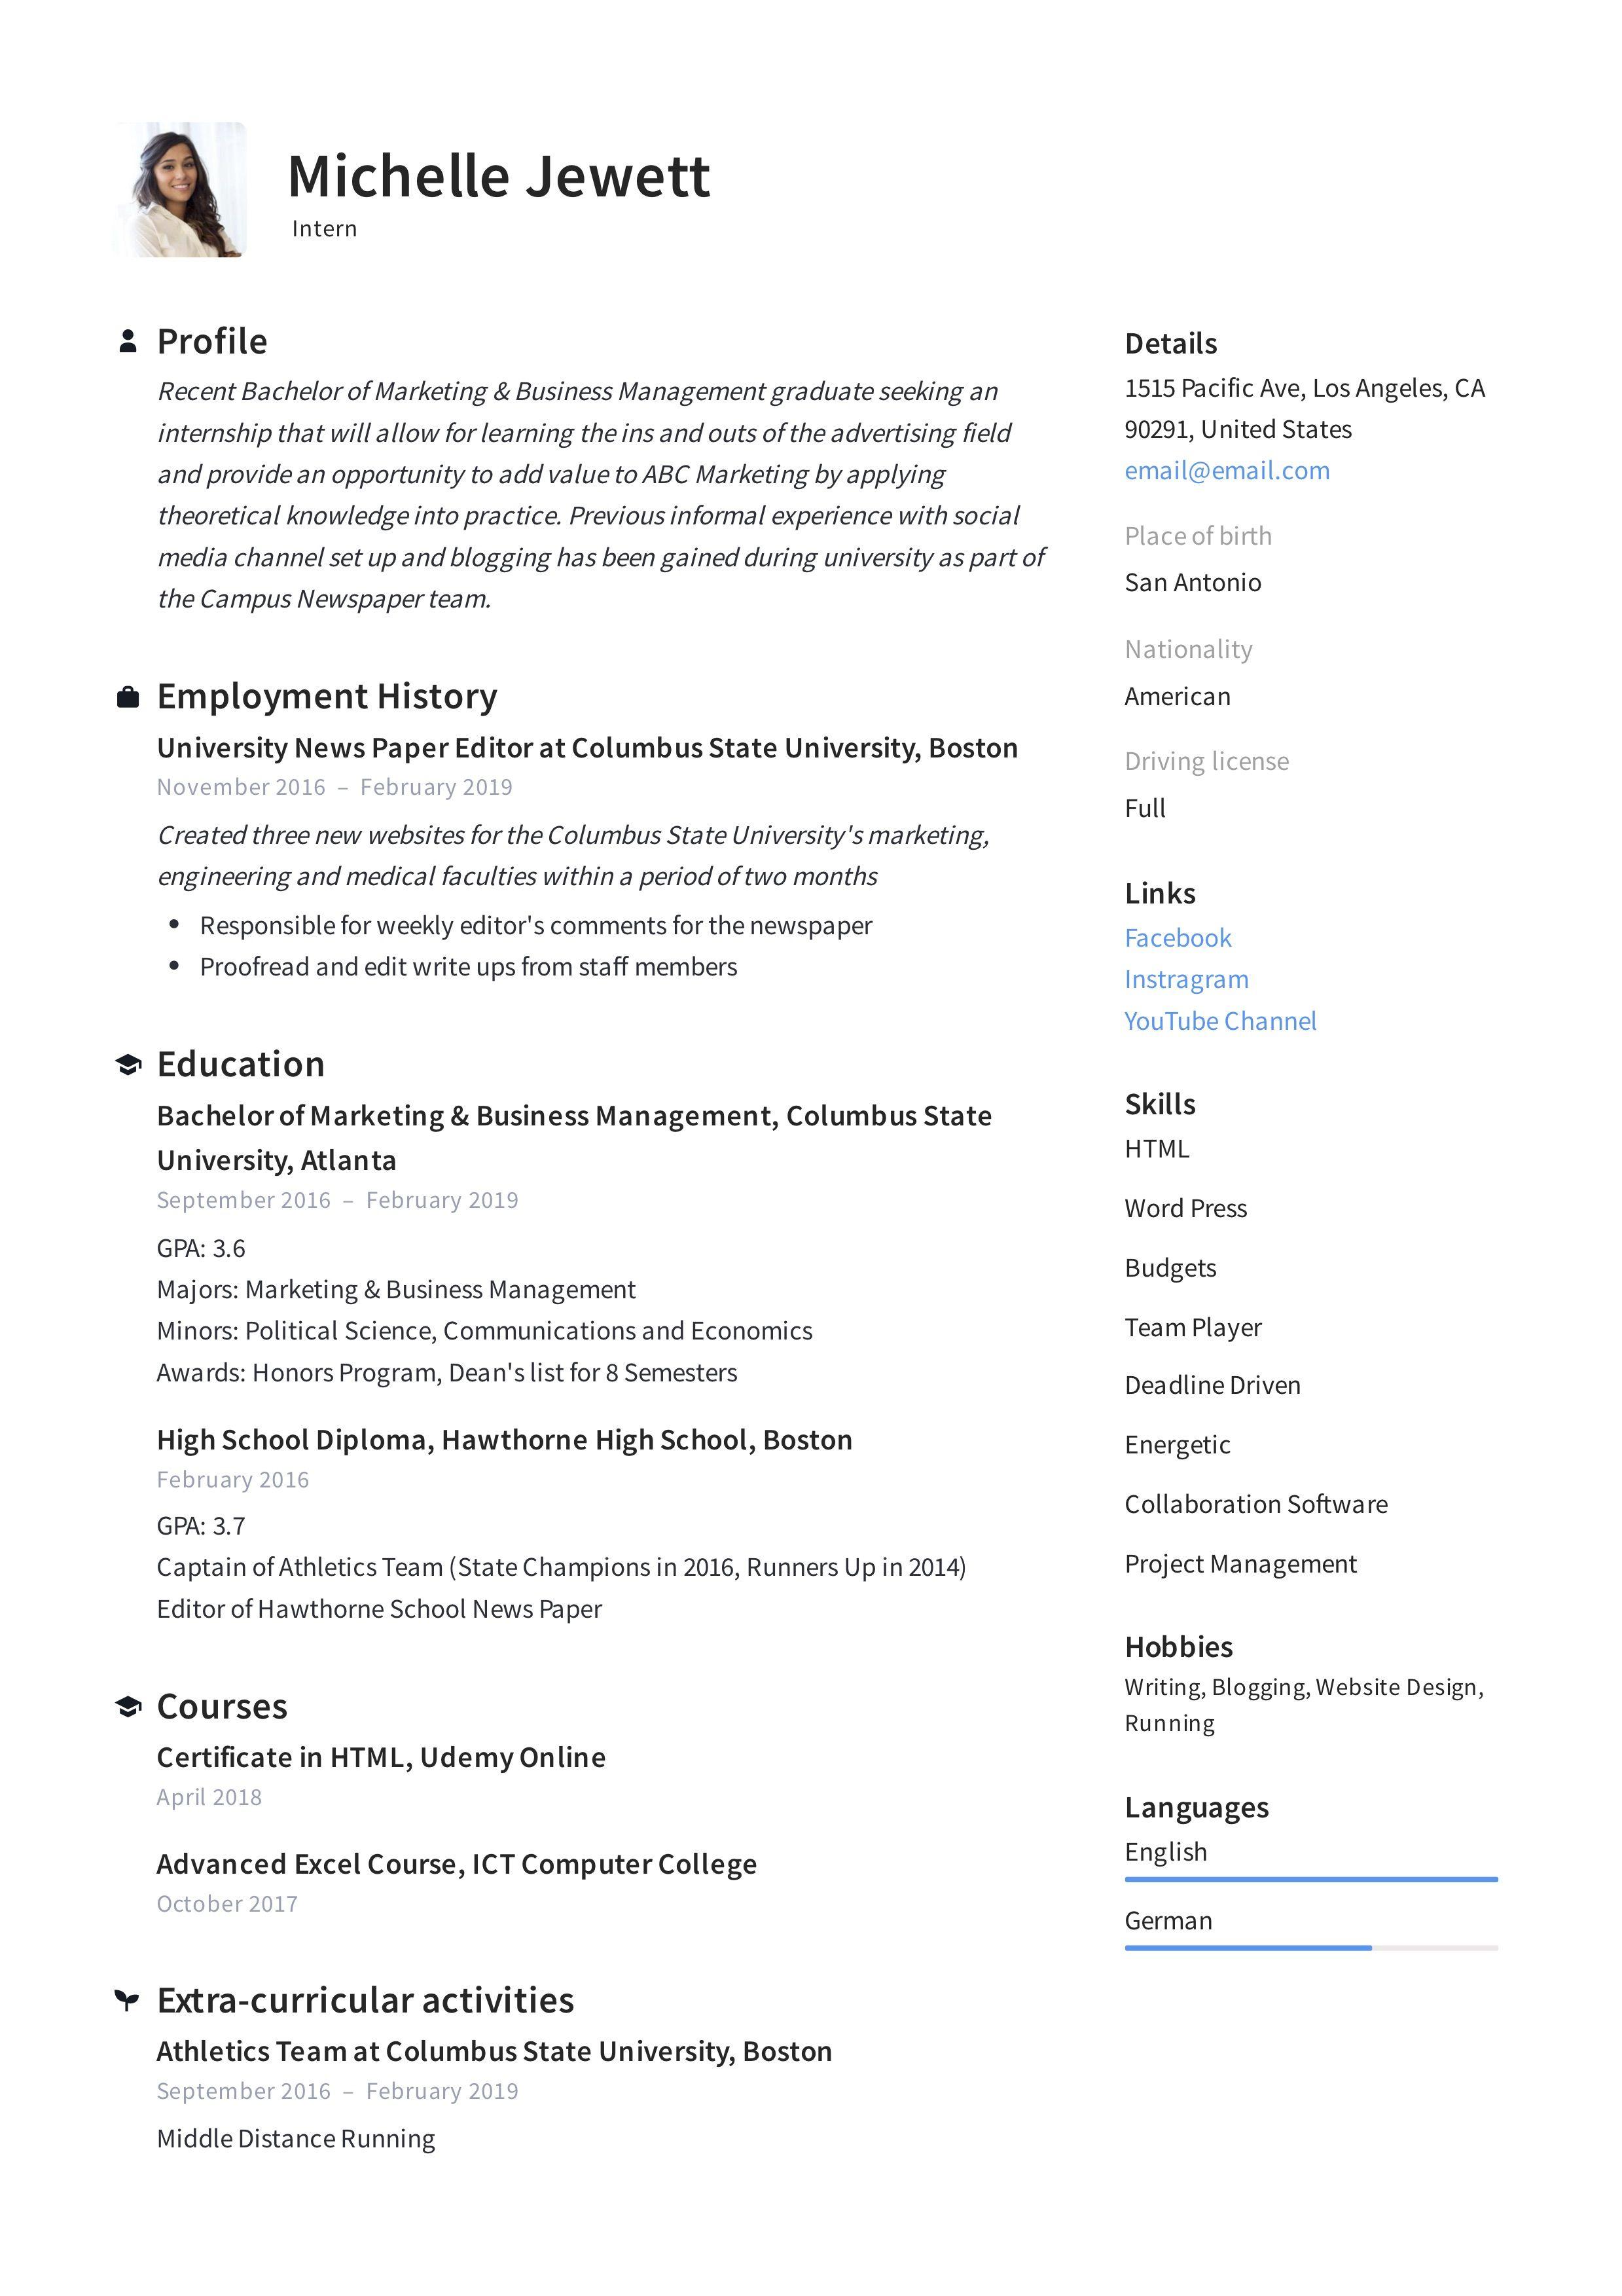 Intern Resume Template Internship Resume Job Description Template Medical Resume Template